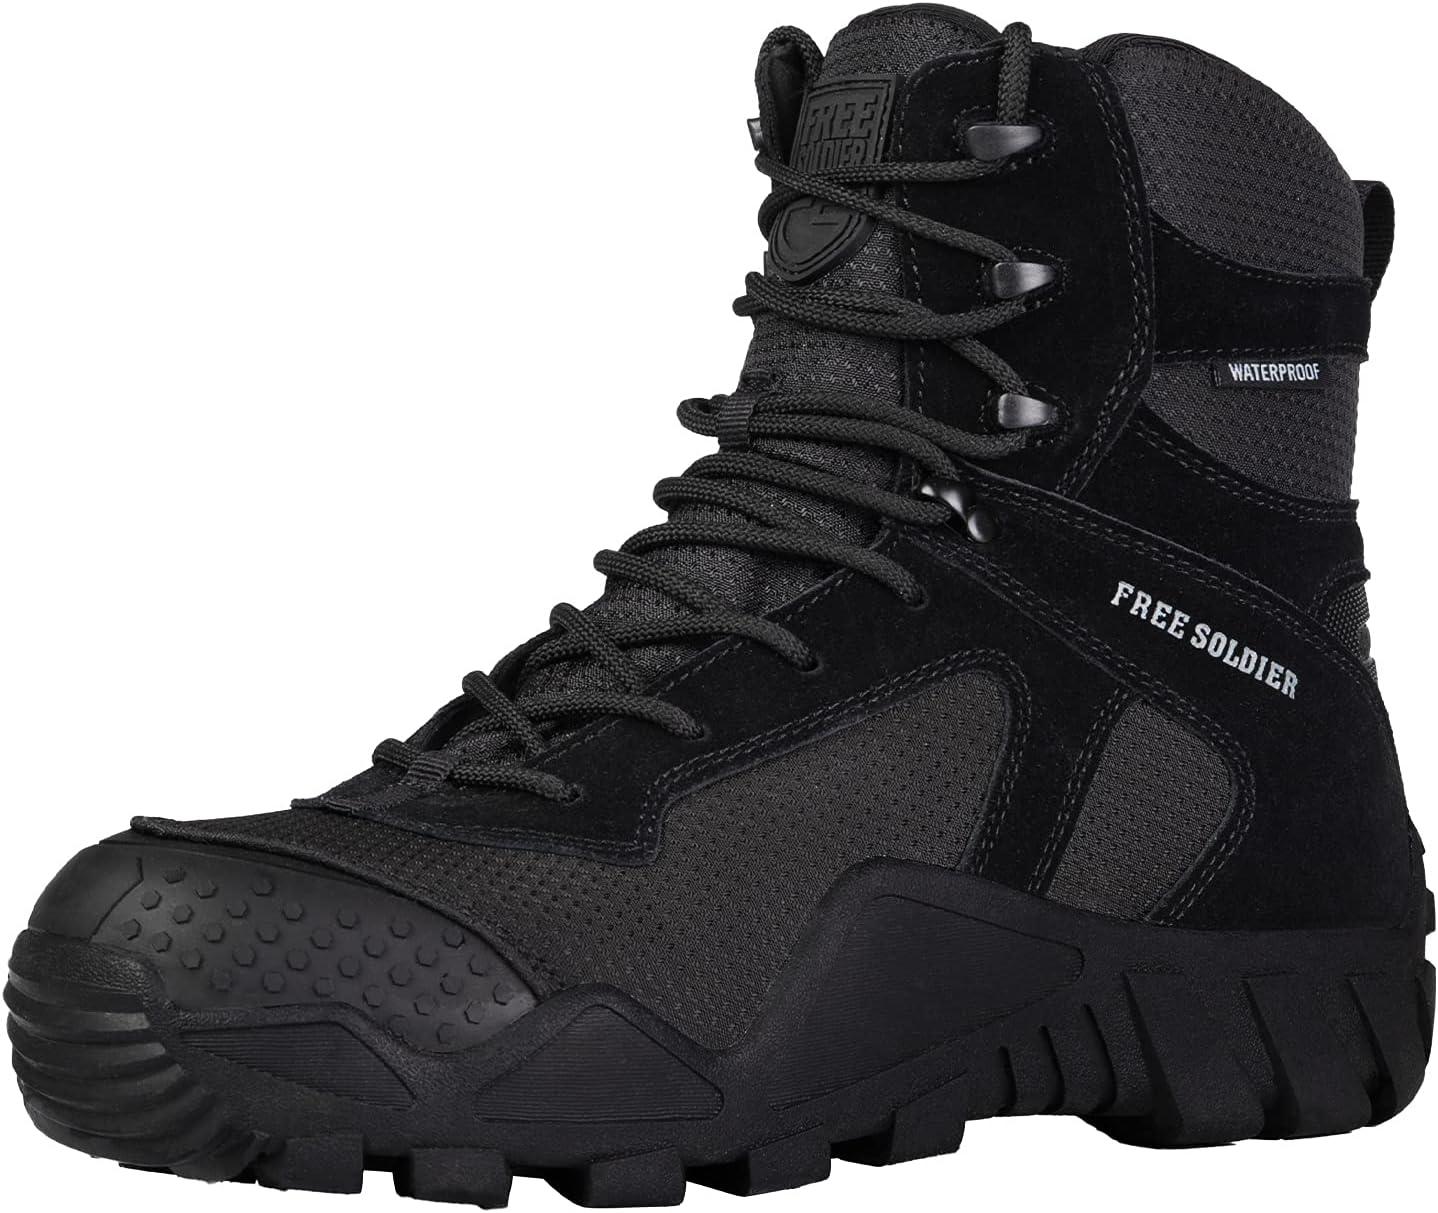 FREE SOLDIER Outdoor Men's Waterproof Boots 待望 Tactical Su Military オンラインショップ